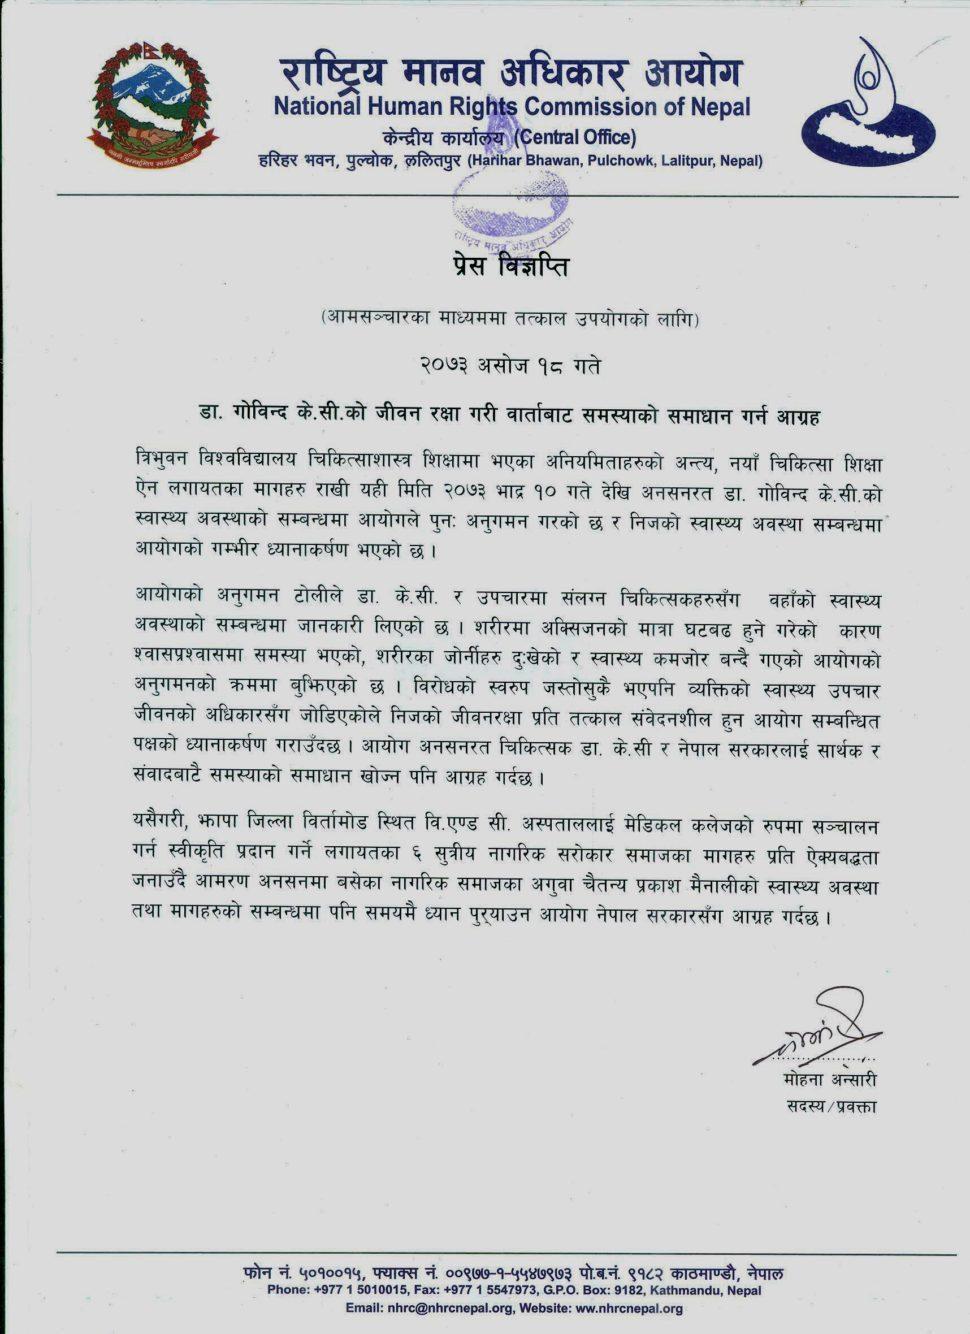 nhrc-press-release-regarding-dr-k-c